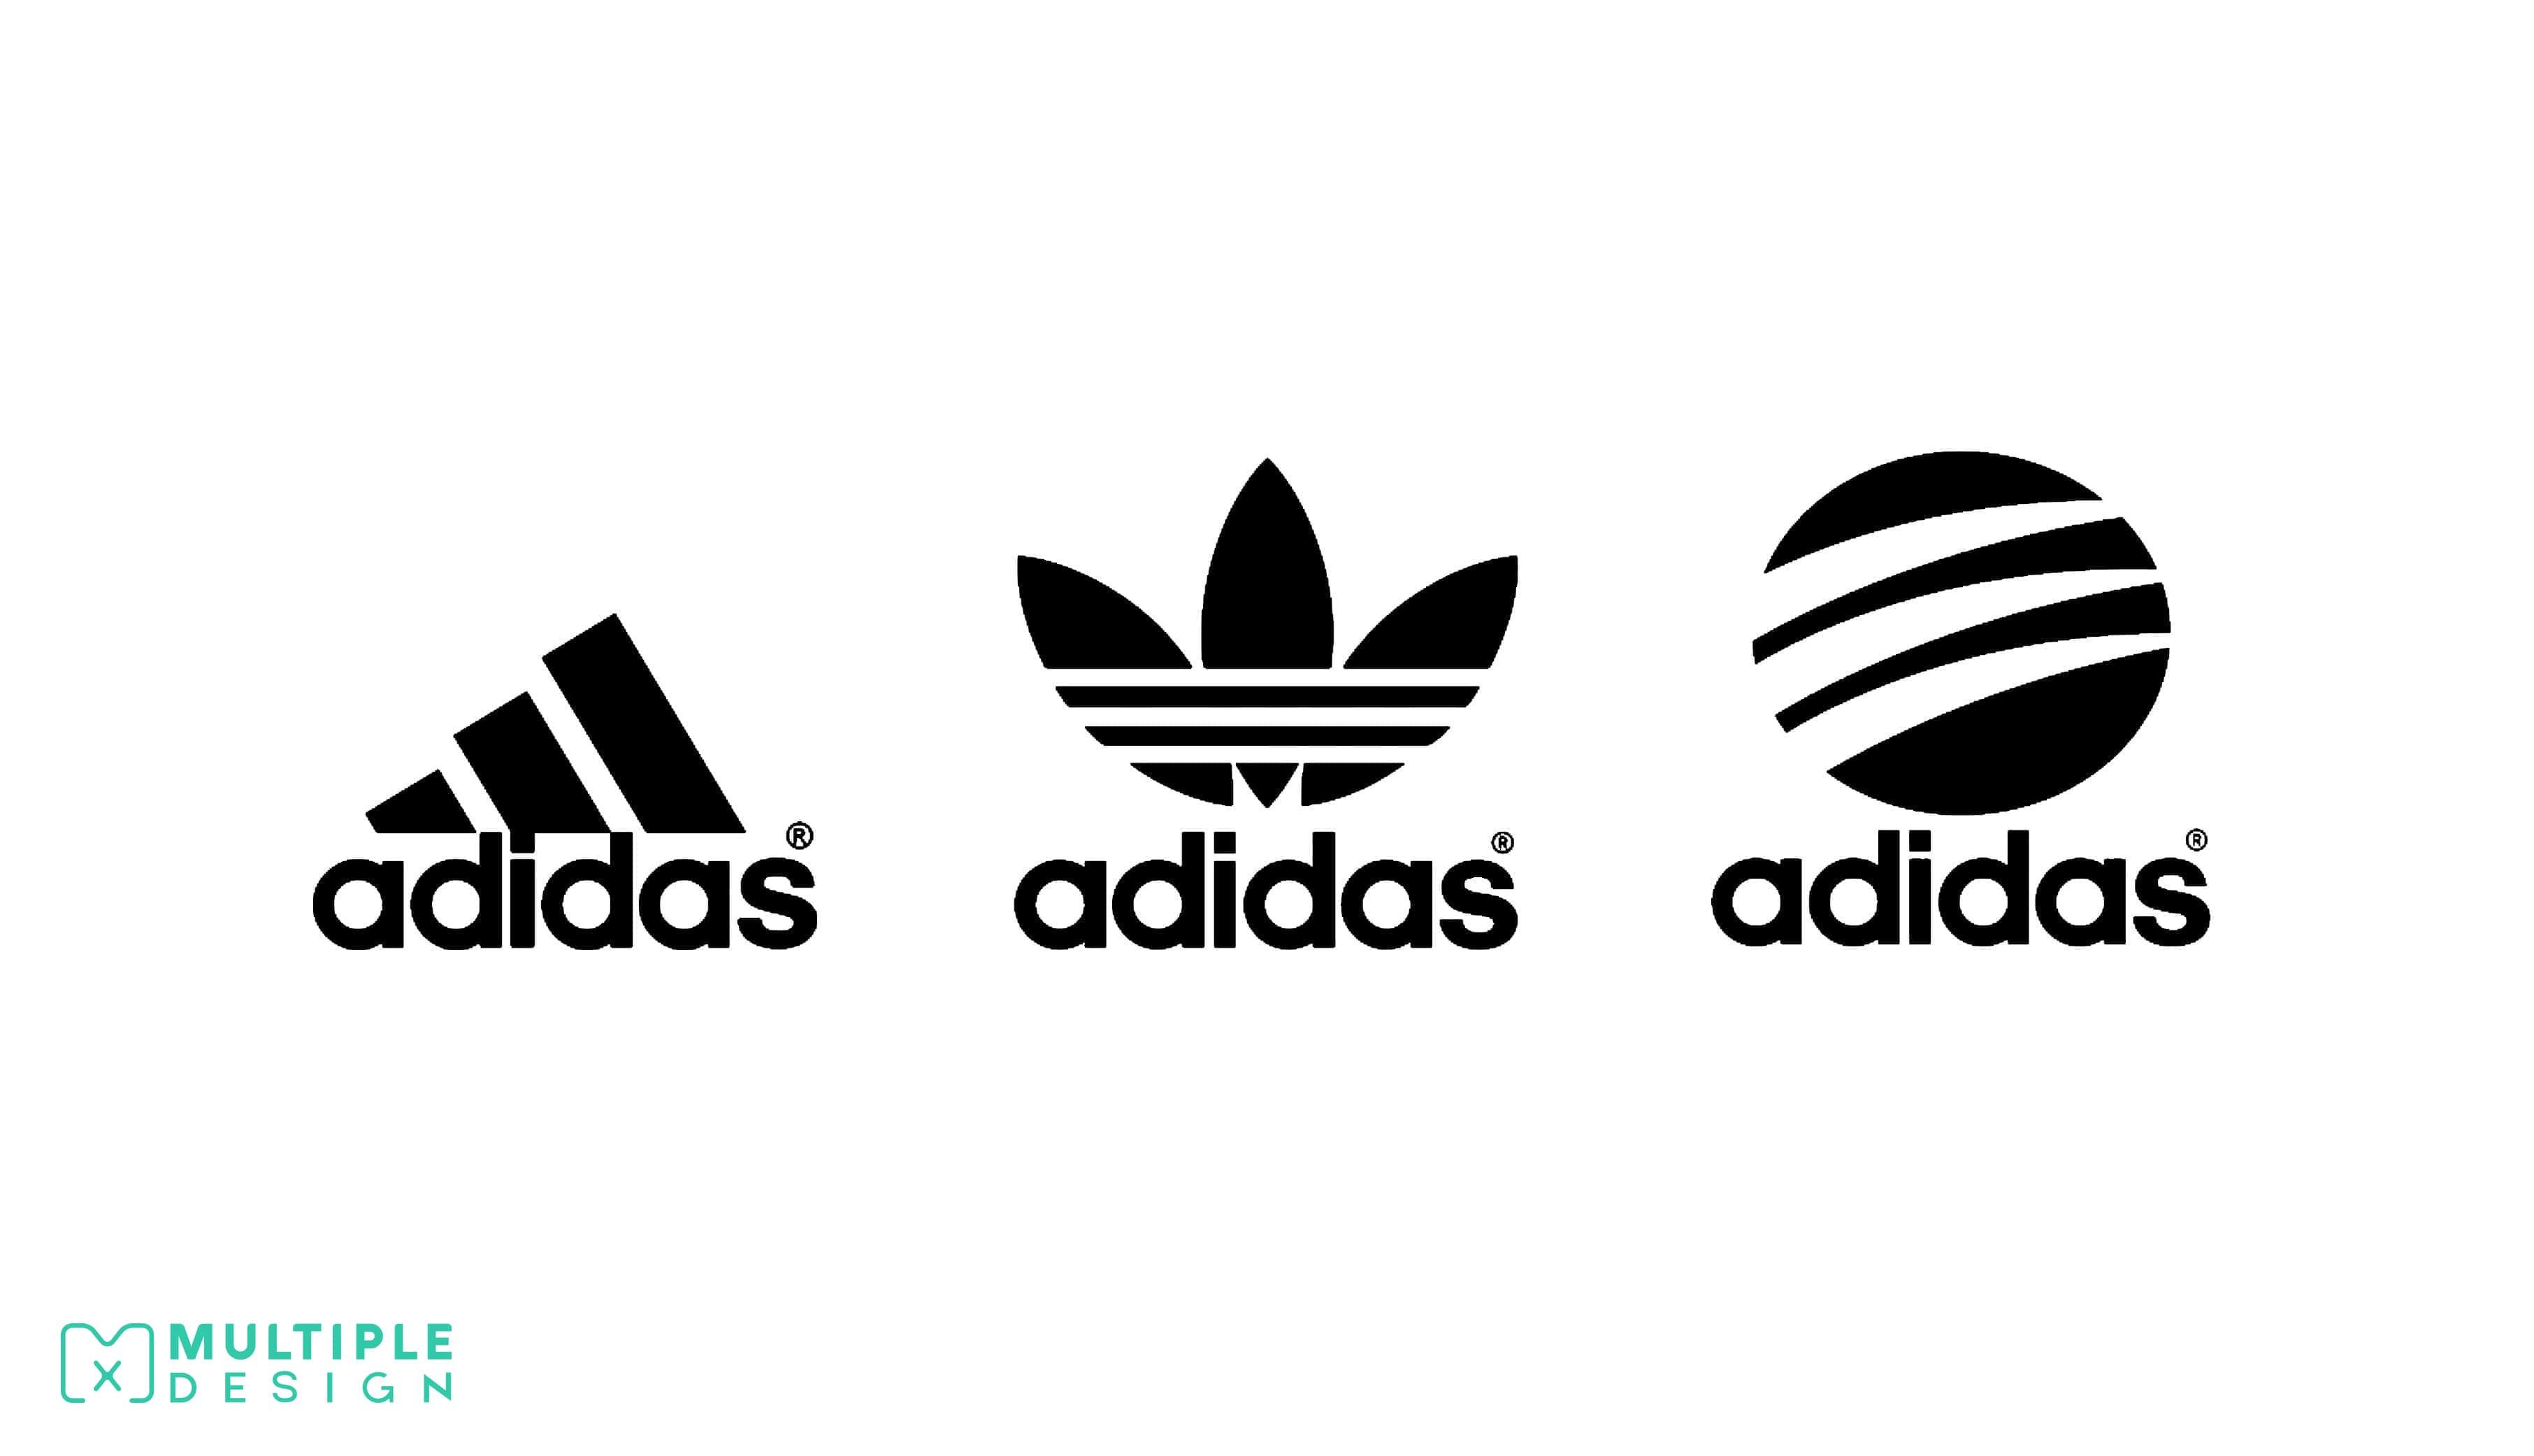 adidas three logos